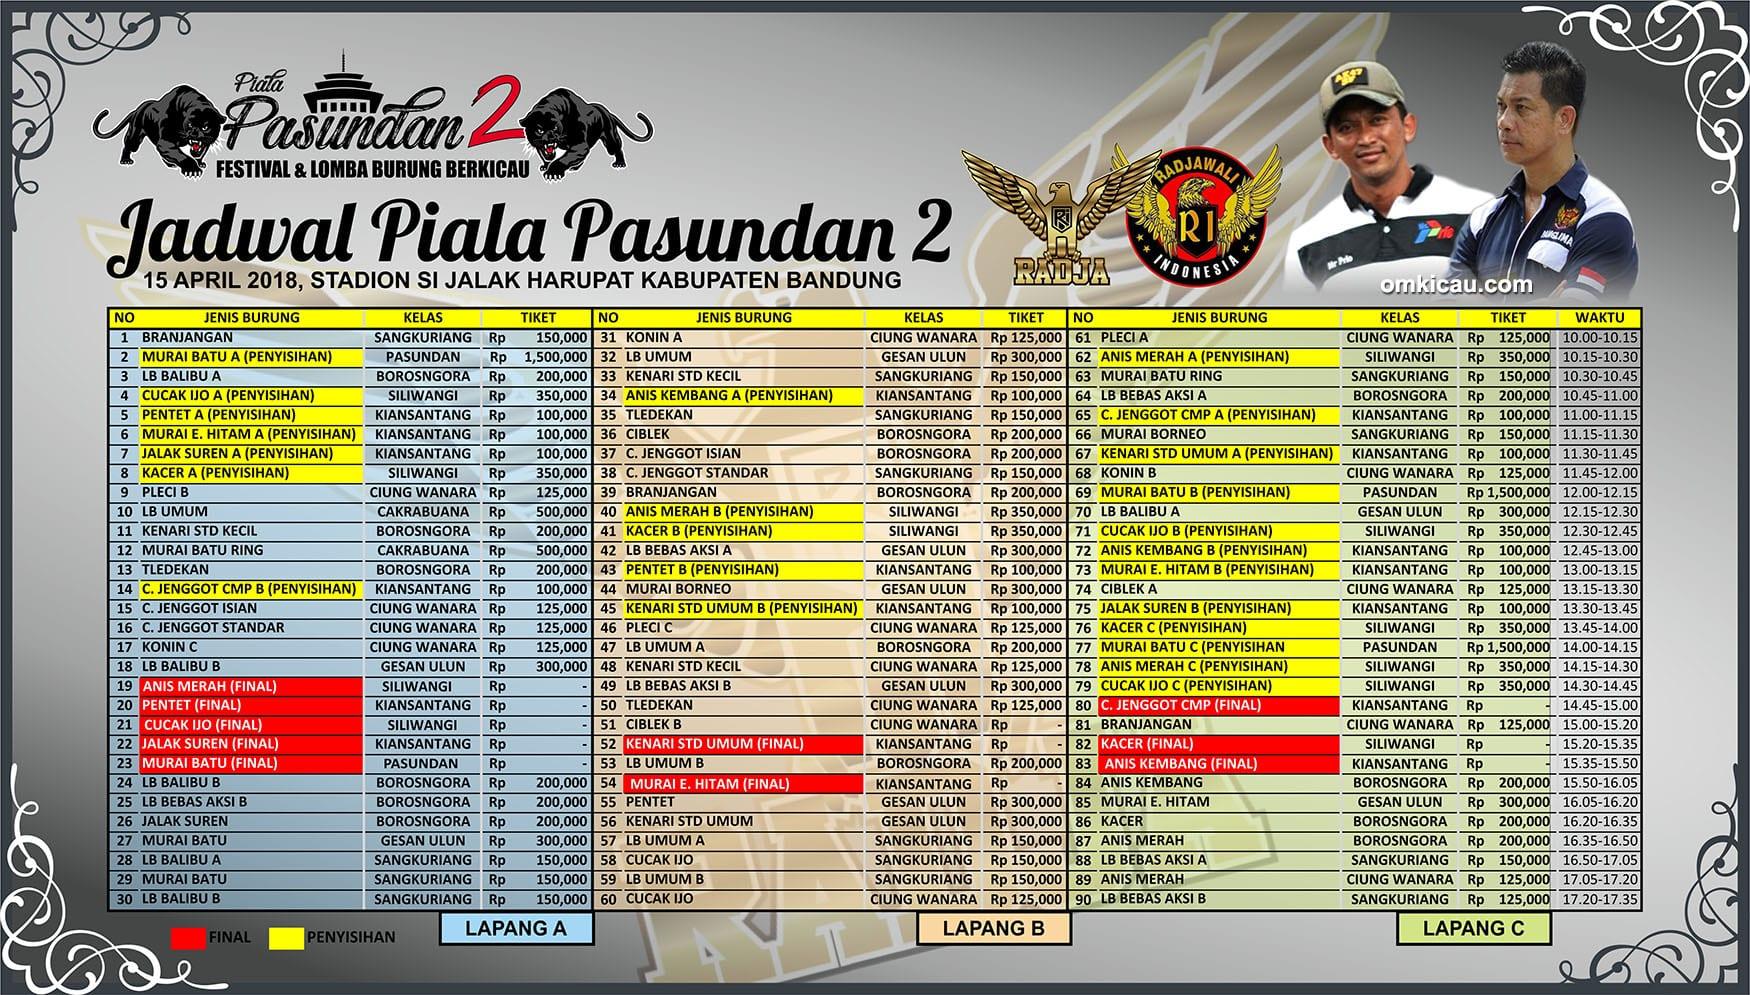 Jadwal Lomba Piala Pasundan 2